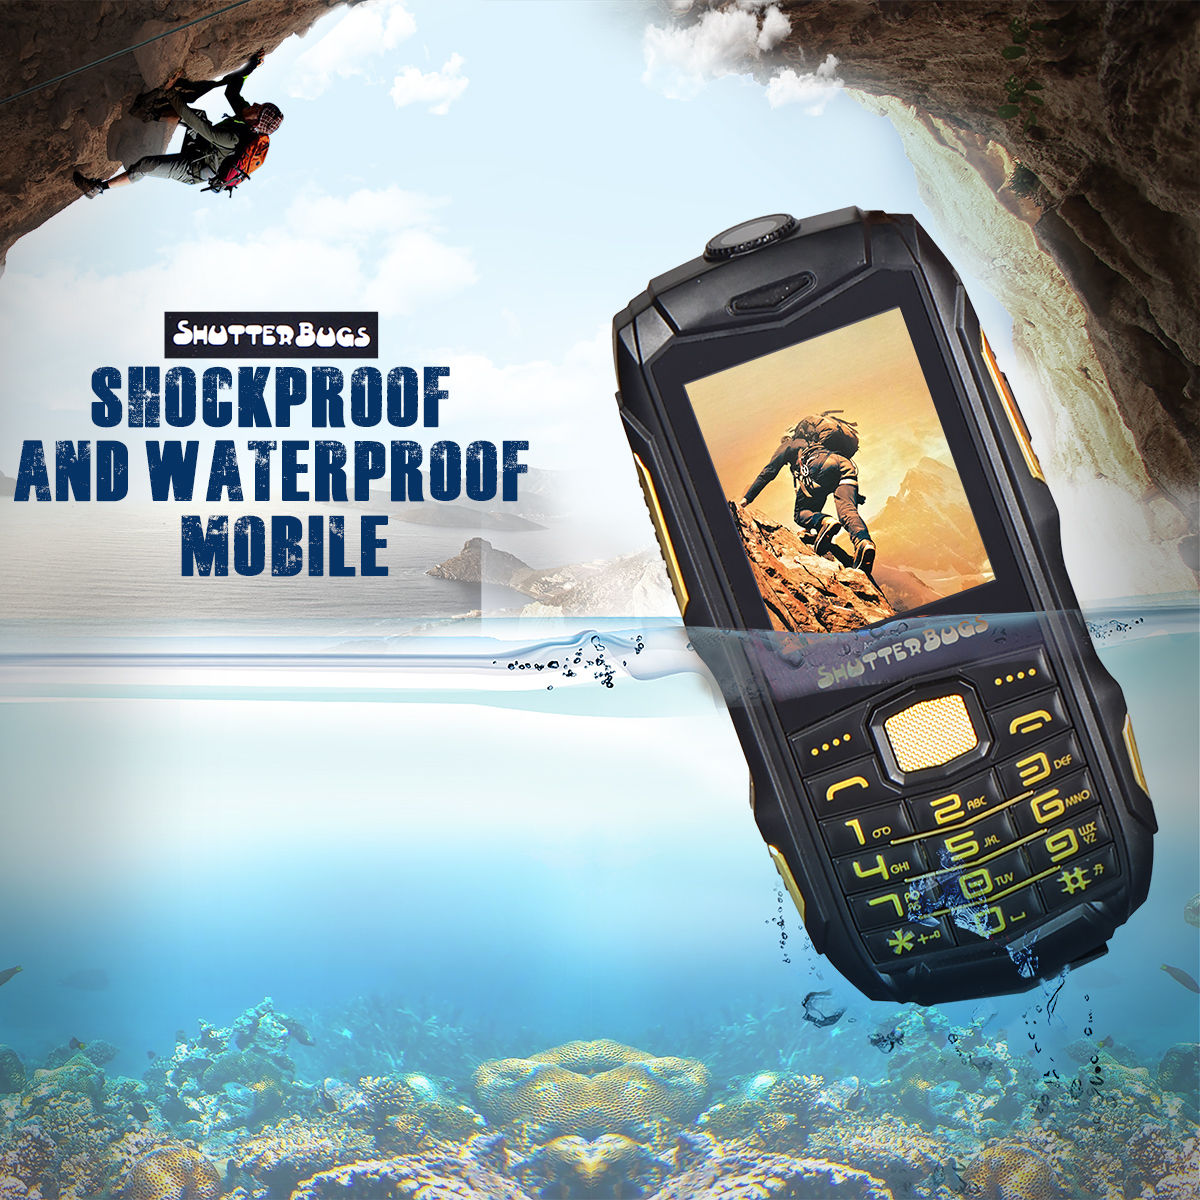 Buy Shockproof And Waterproof Mobile Online At Best Price